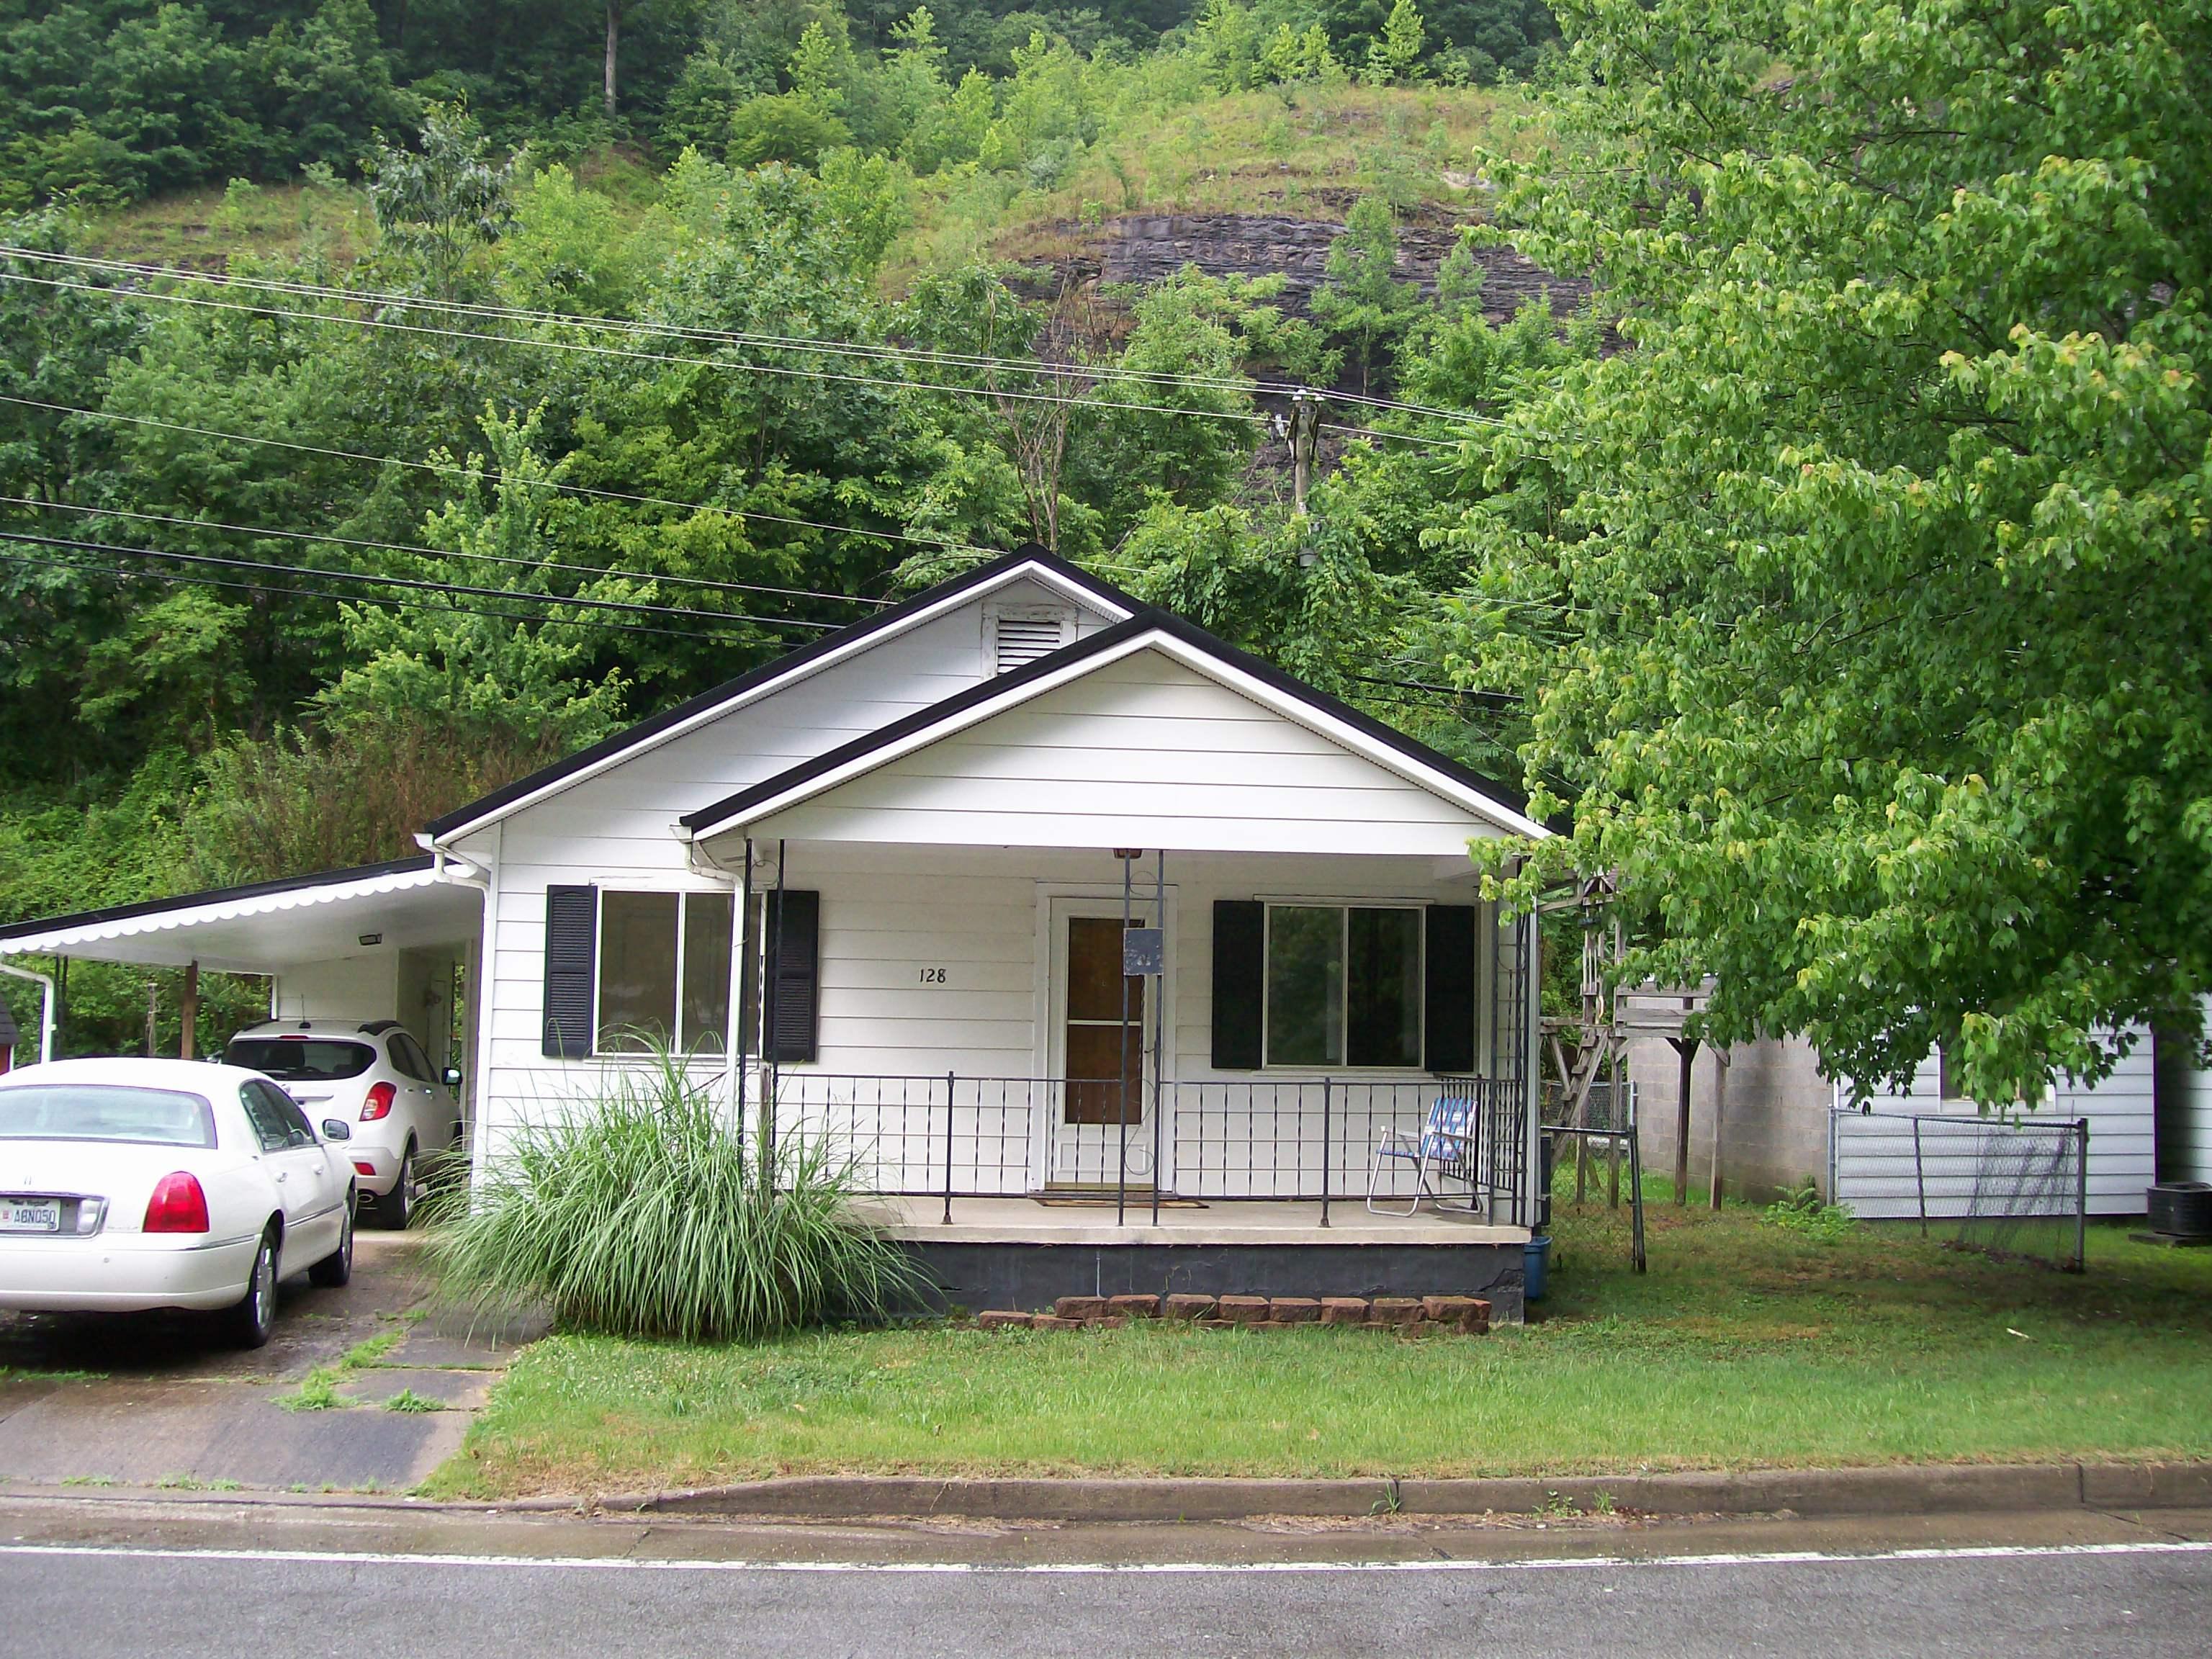 128 Copperas Fork Road, Holden, West Virginia 25625